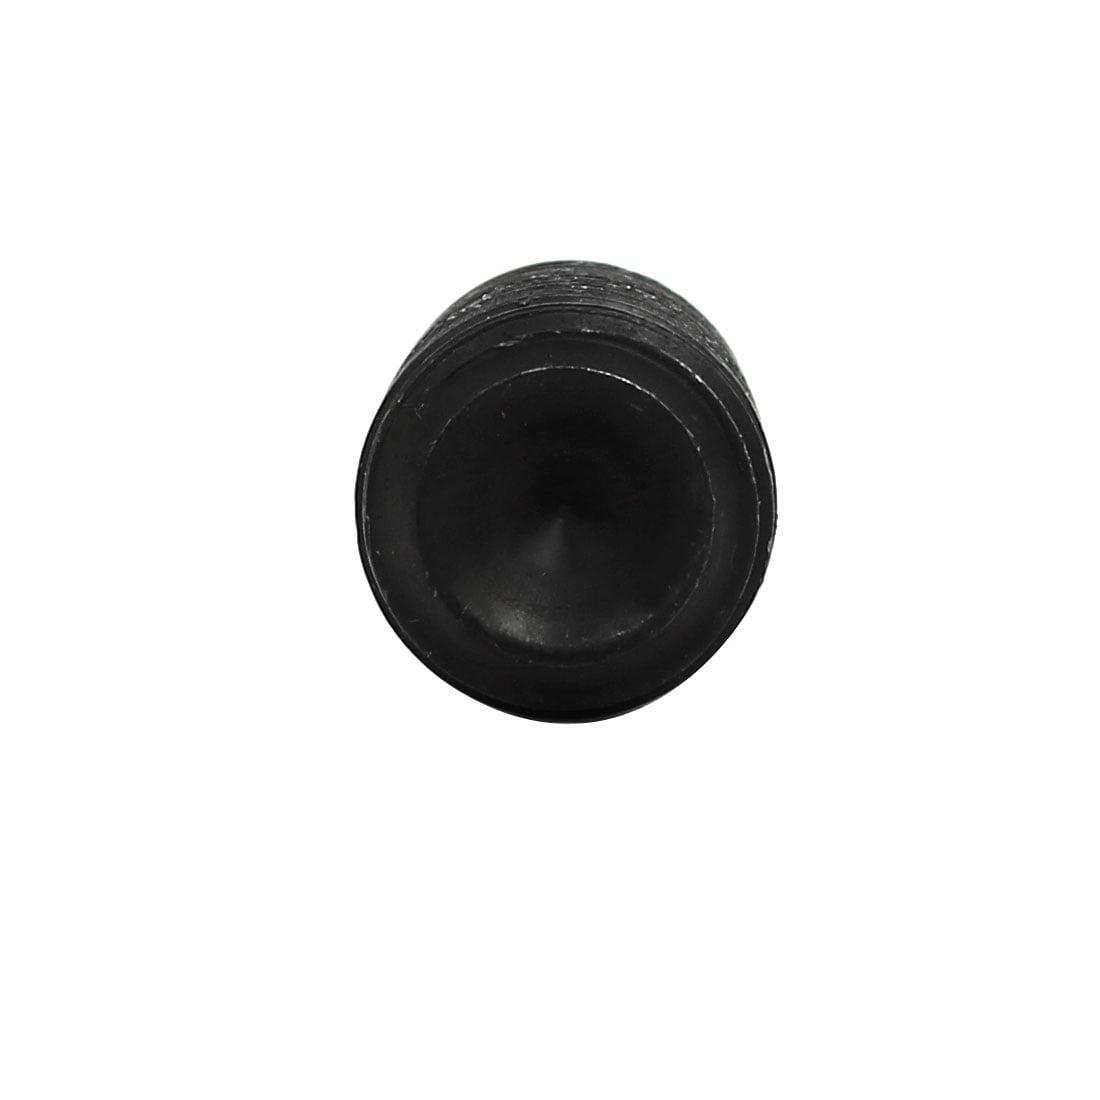 M20 Dia Thread 10.9 Grade 50mm Long Cup Point Head Hex Socket Grub Screw DIN916 - image 2 of 4